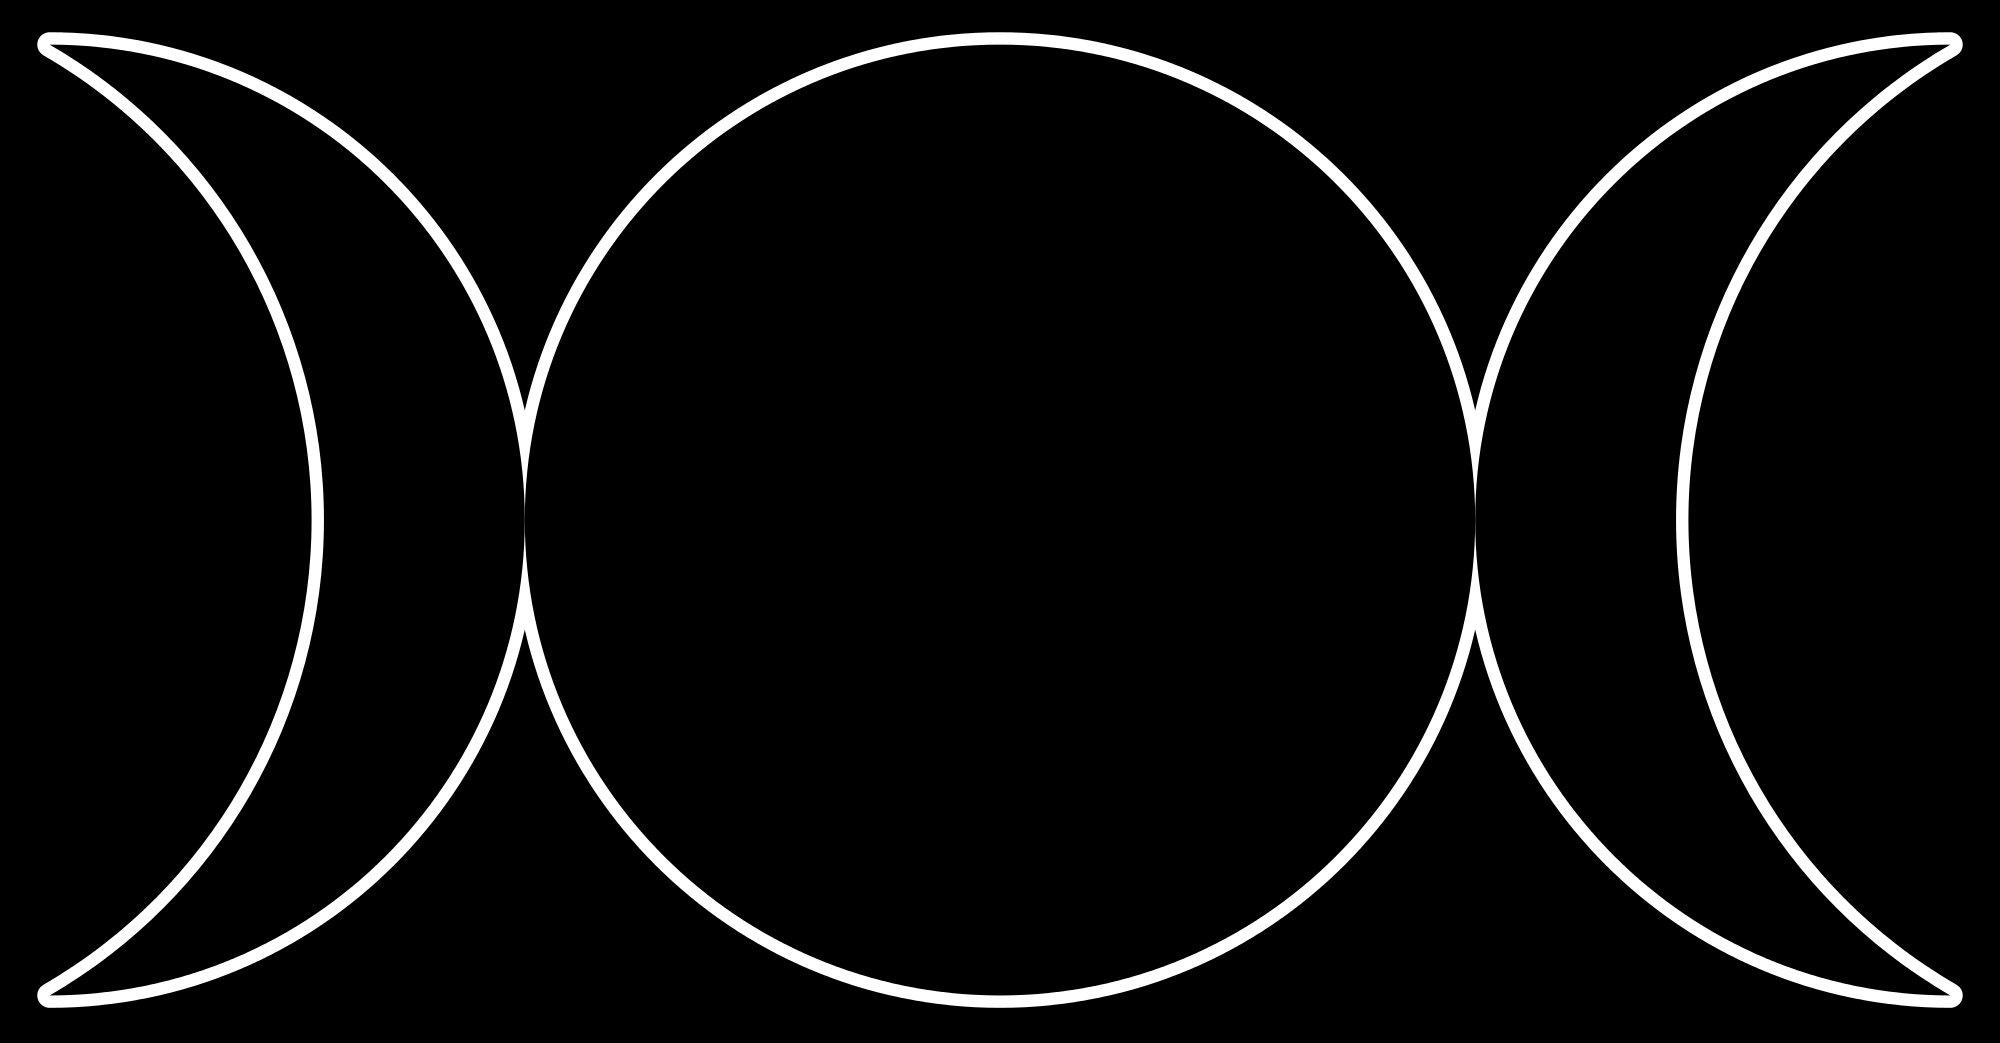 dark, fantasy, occult, religion, wicca